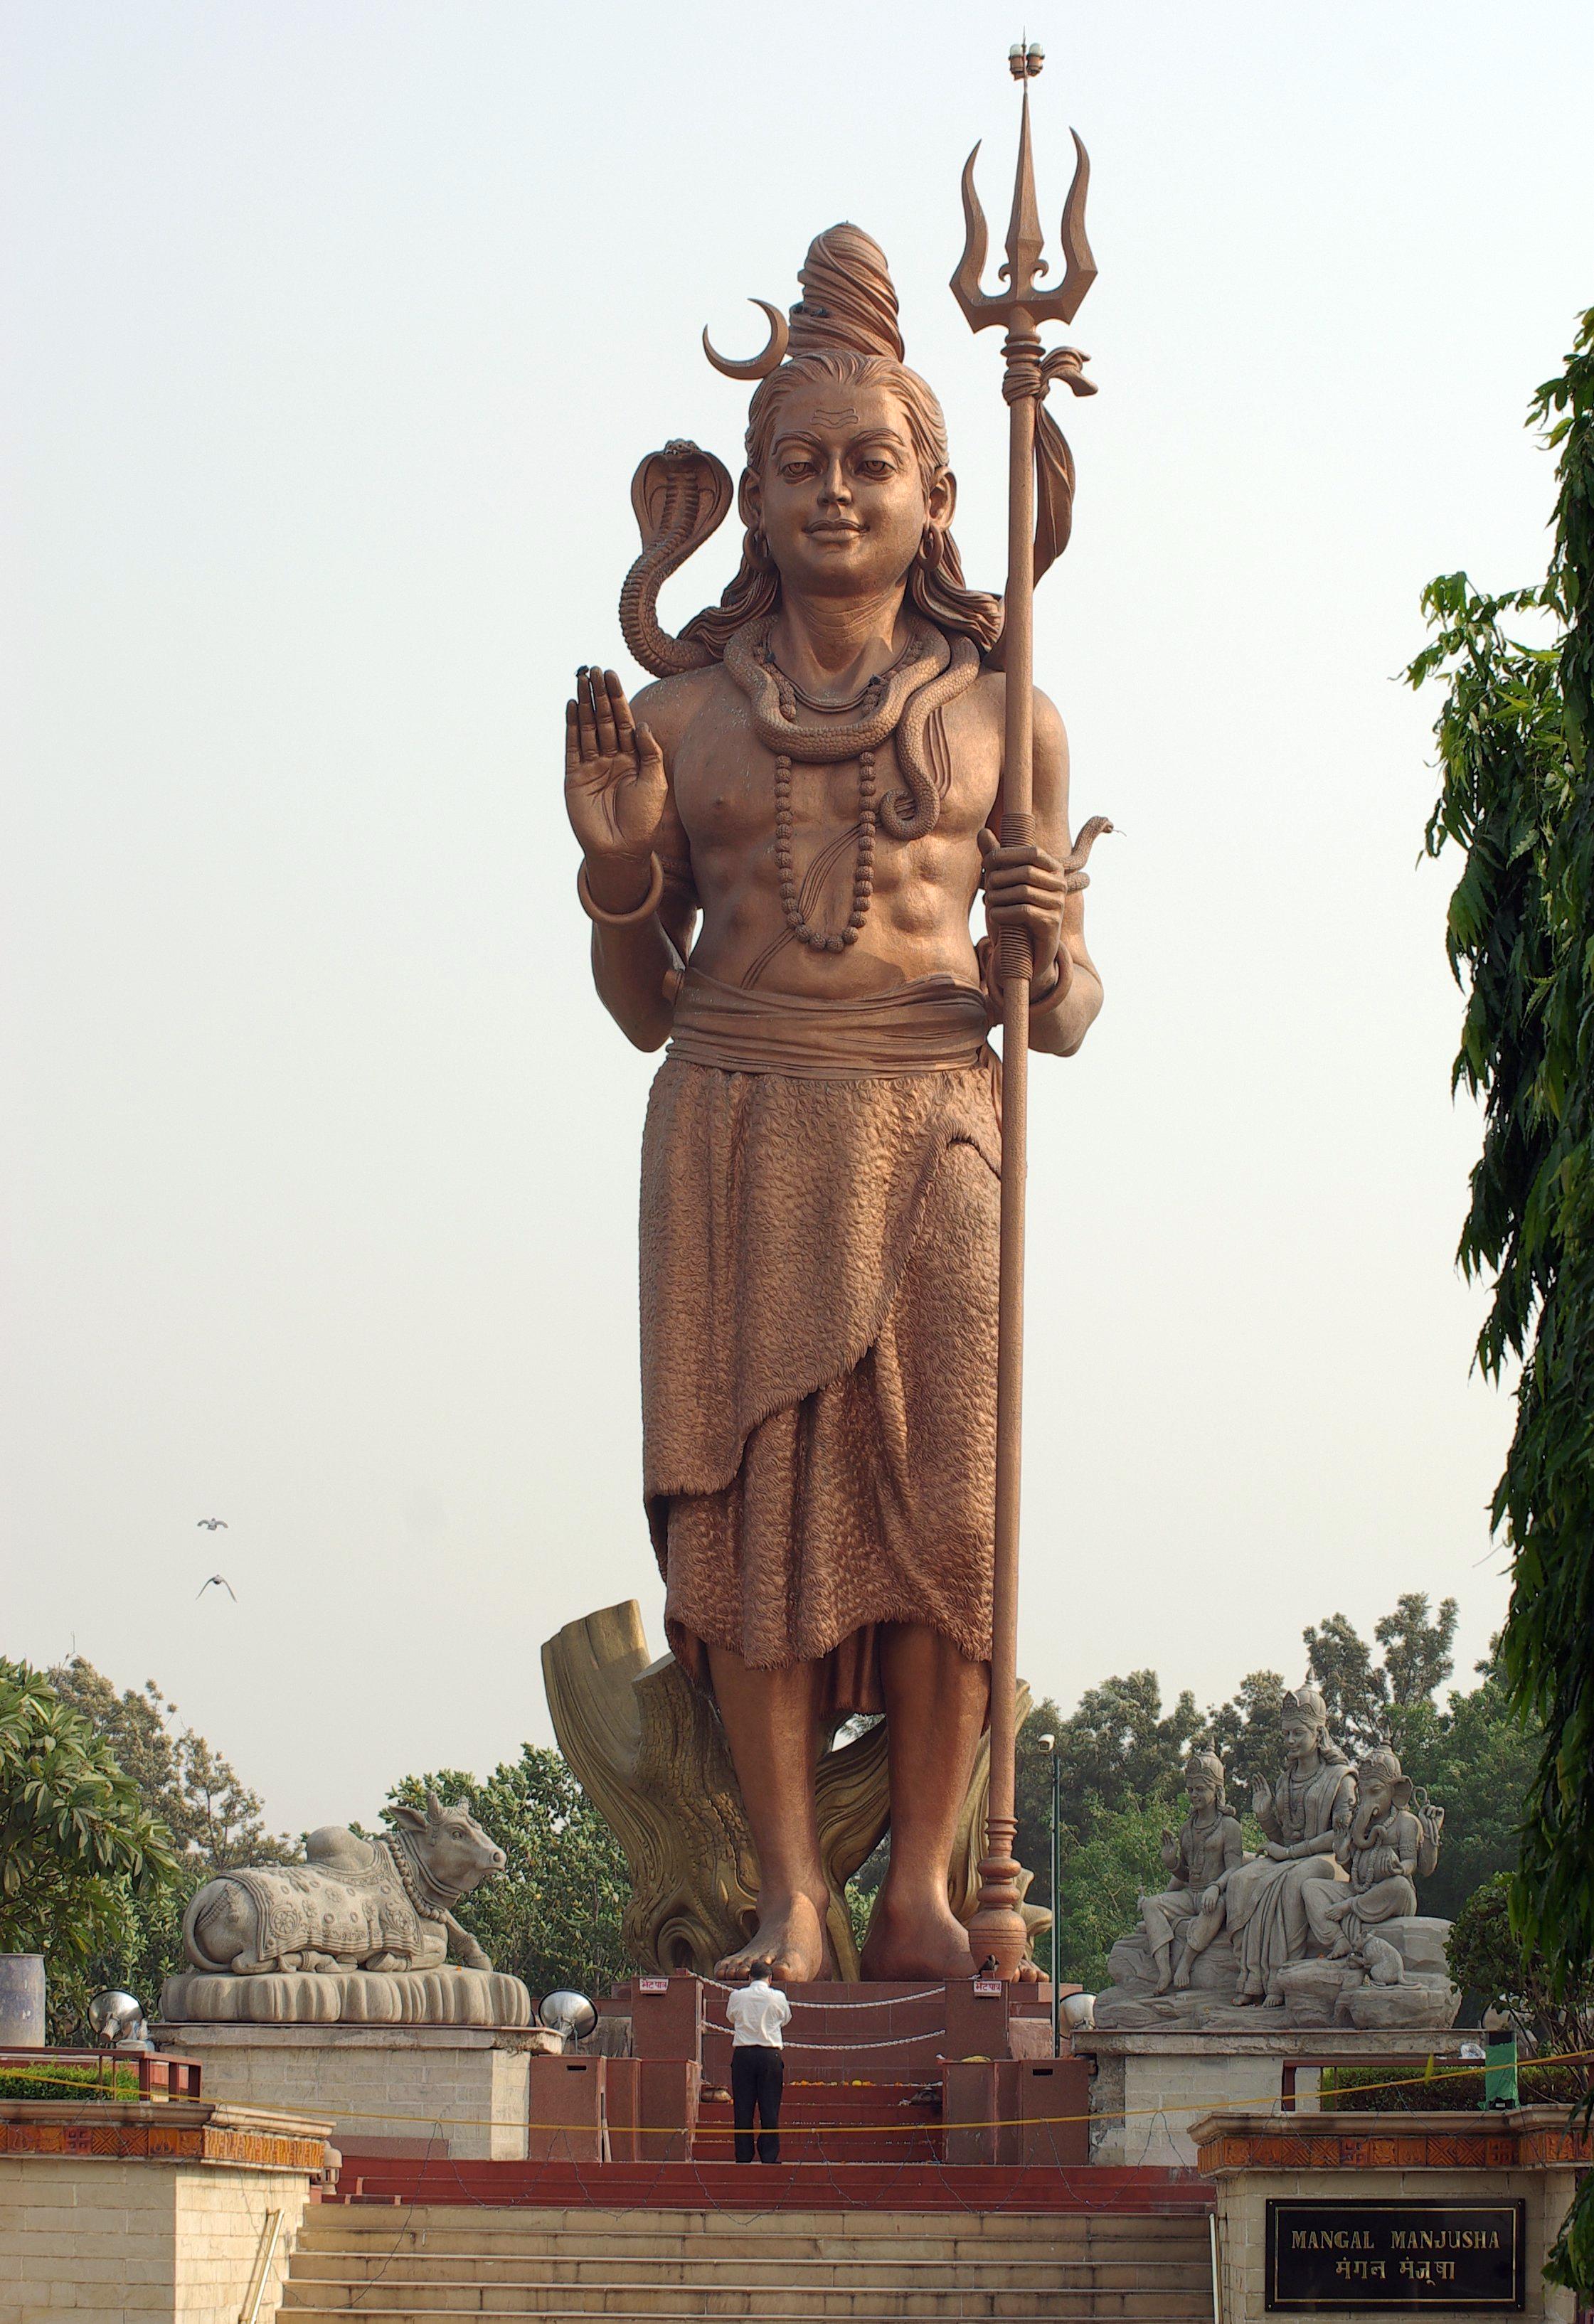 Hindu's primal deity Statue_of_lord_shiva